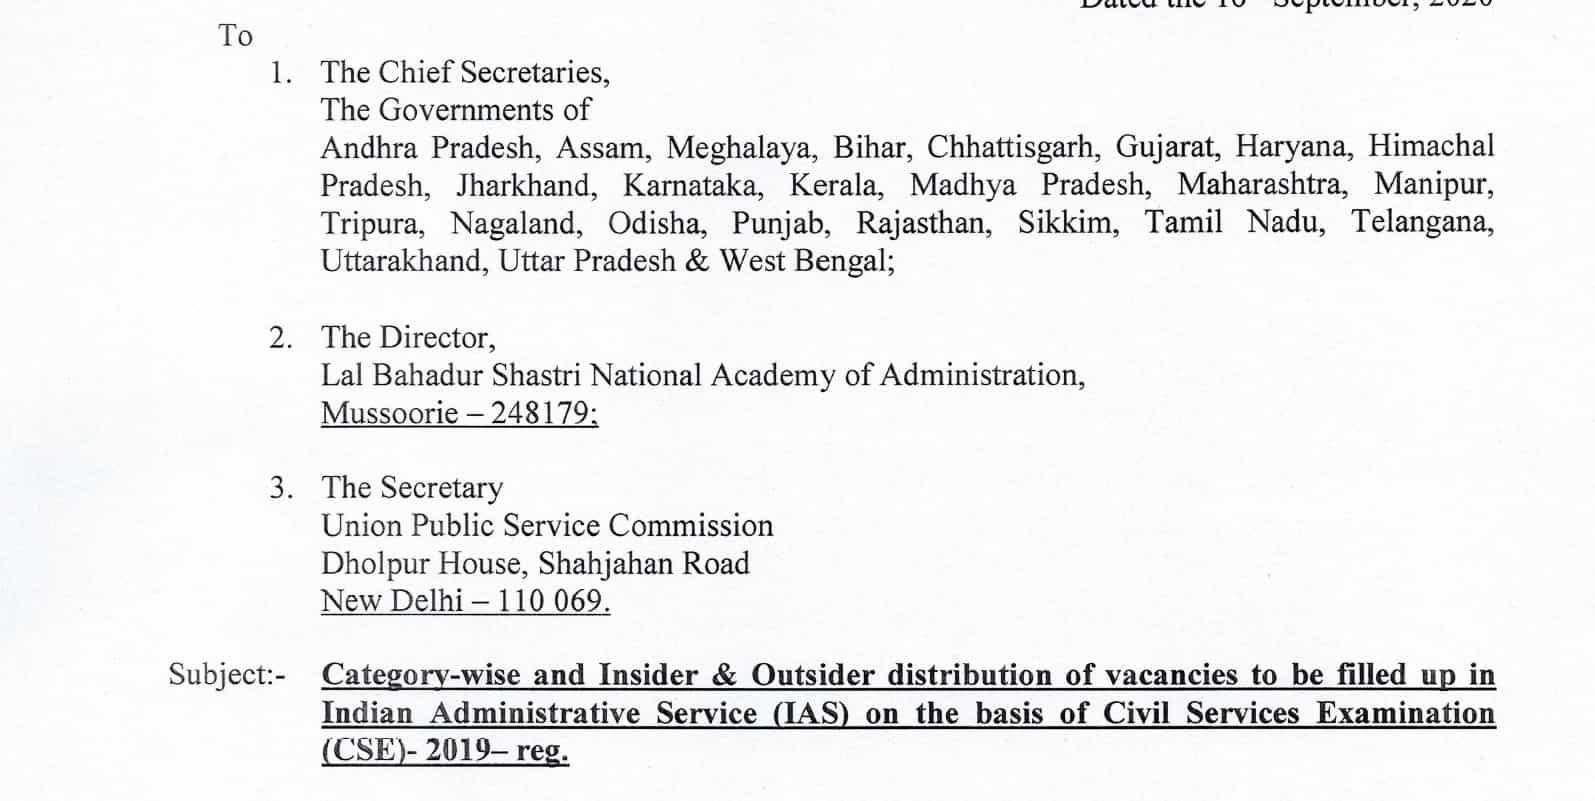 UPSC CSE 2019 IAS Officers Allocation